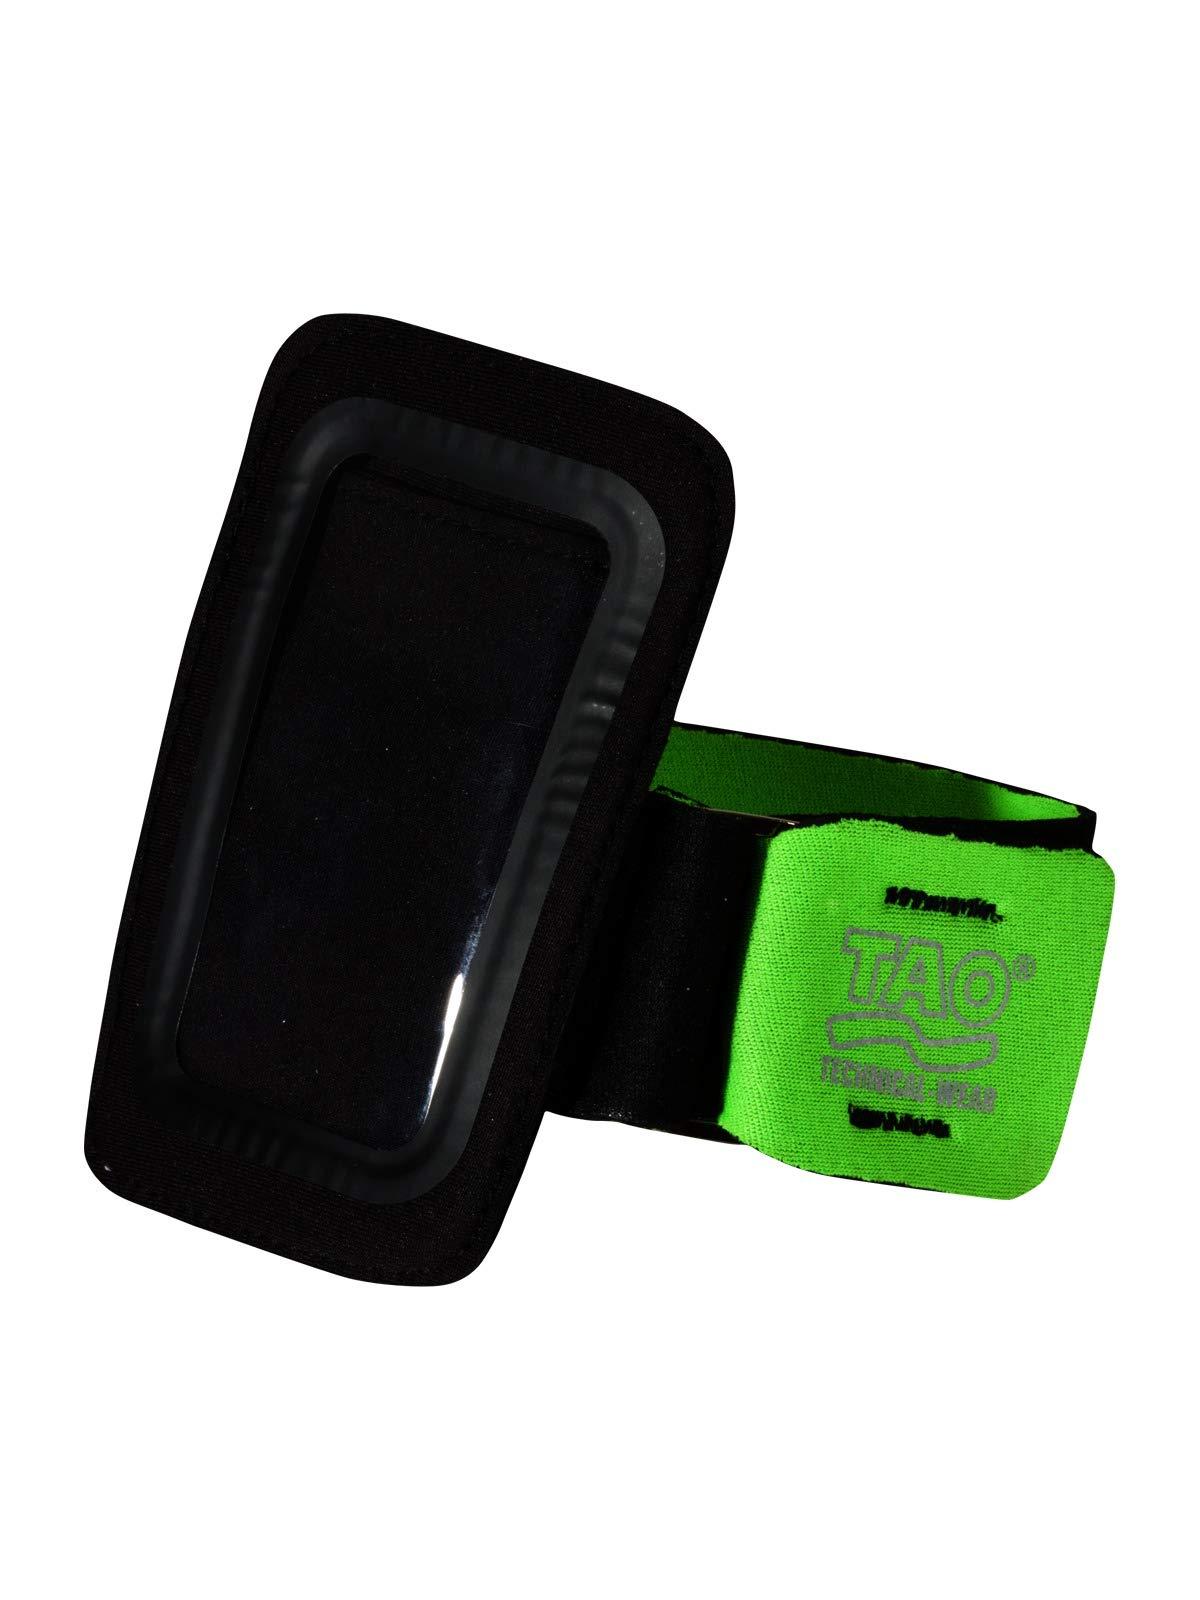 TAO Sportswear Gürtel Accesories, Black, One Size